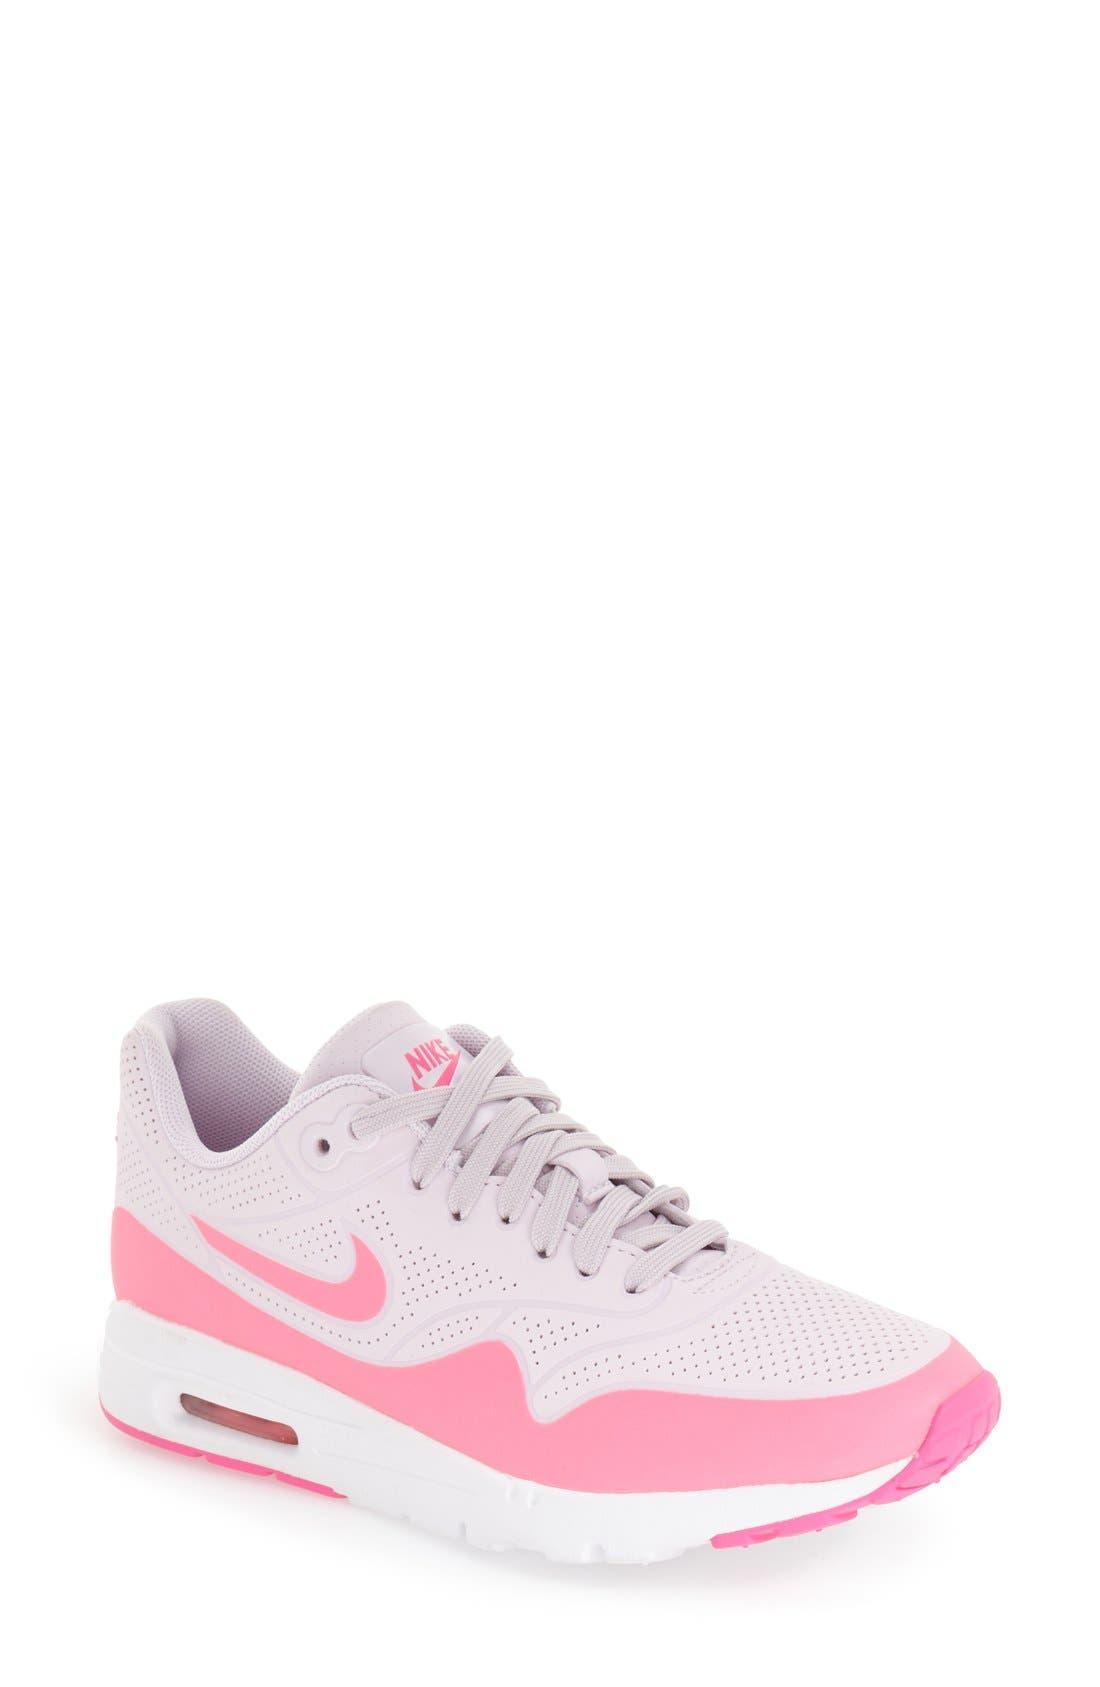 Main Image - Nike 'Air Max 1 - Ultra Moire' Sneaker (Women)